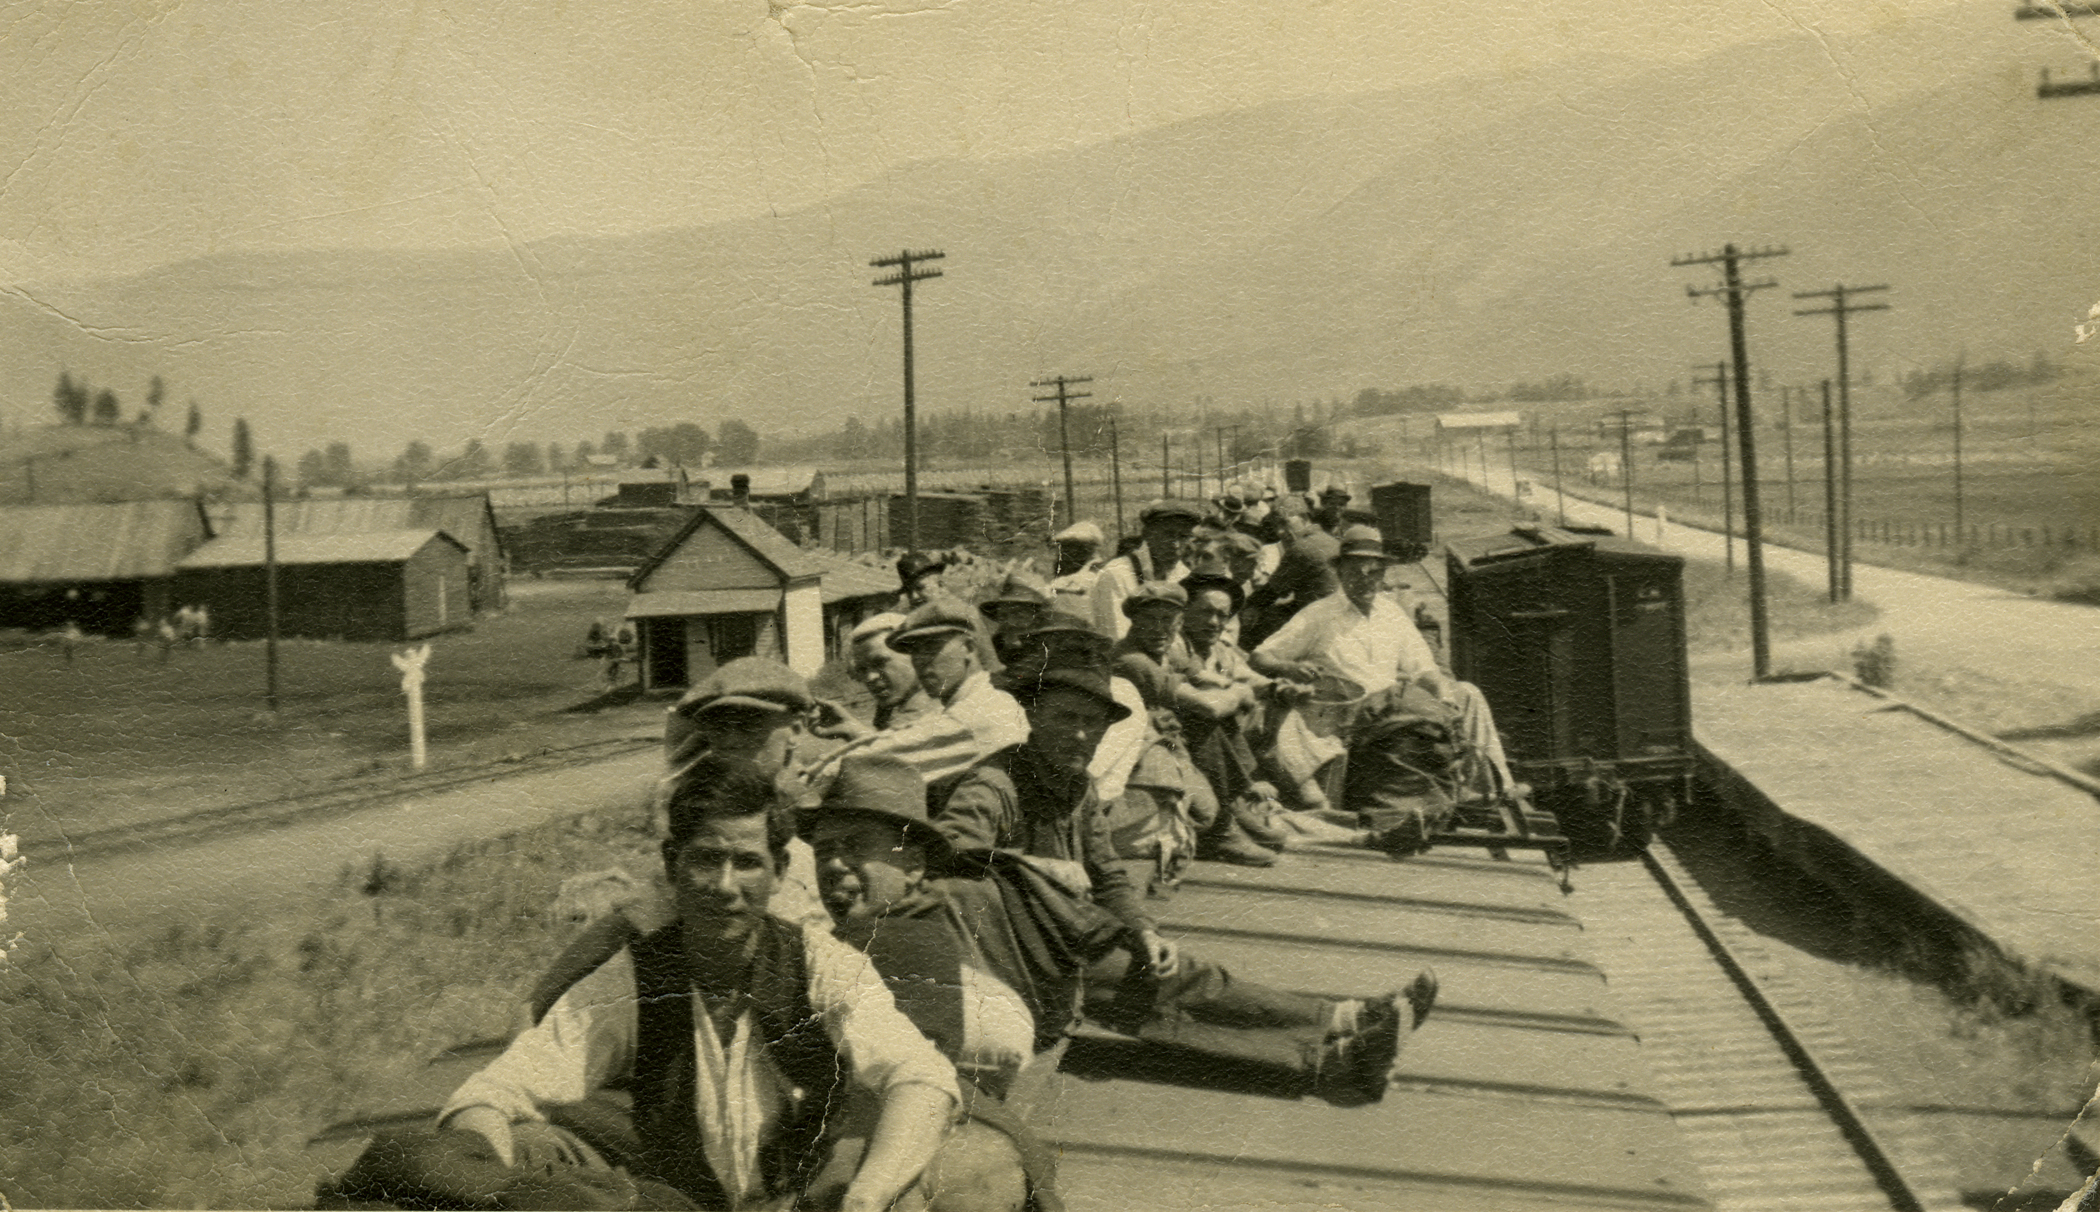 David-Yorke-Photos-riding-the-train-nd-NIS_HR